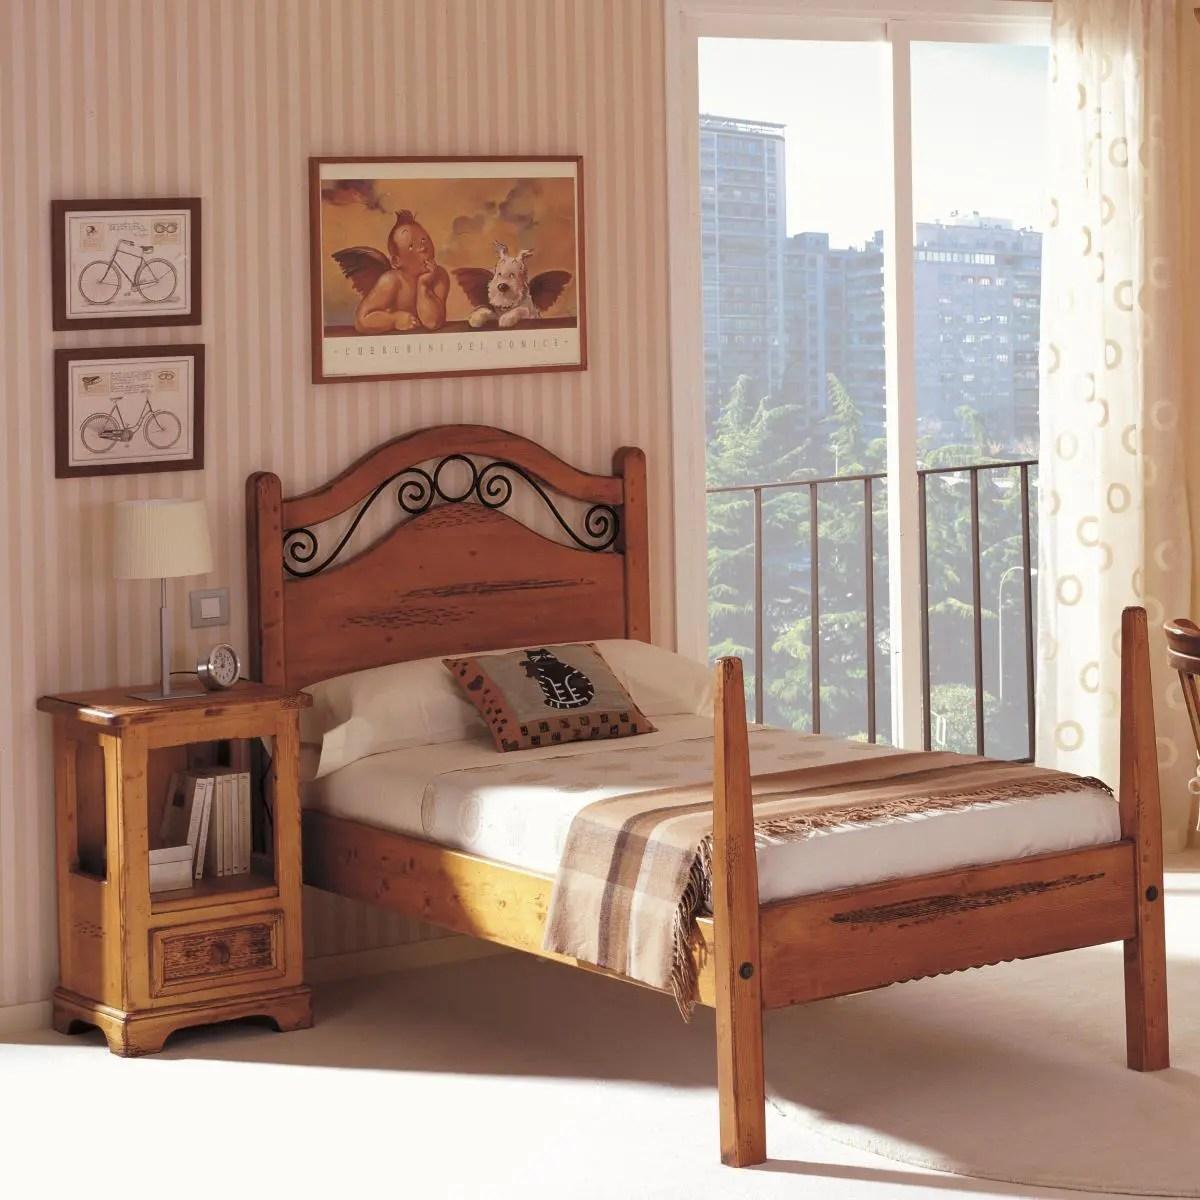 cama sofa forja purple chair rústica de madera ecorústico venta muebles